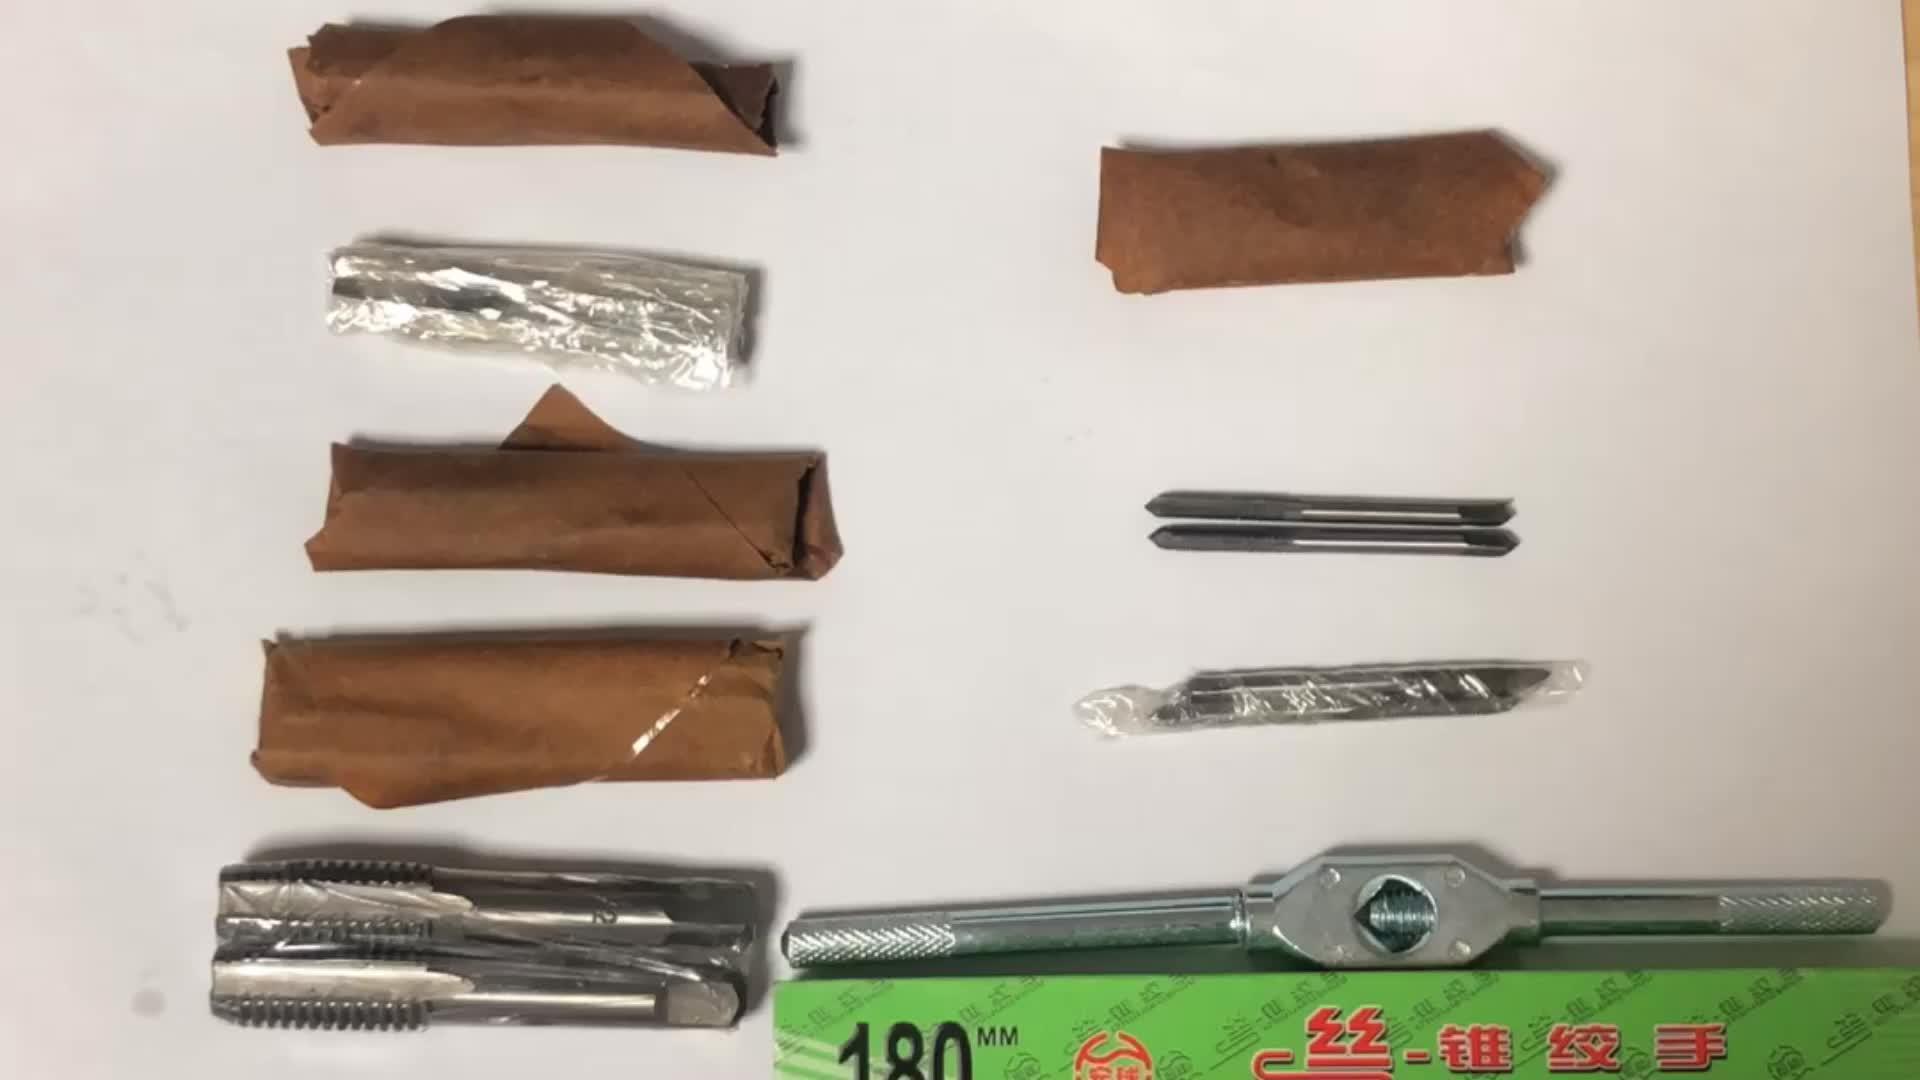 Venta caliente Fabricante pistola de grasa accesorios grasa punta de pistola de grasa de boquilla de cobre 2pcs